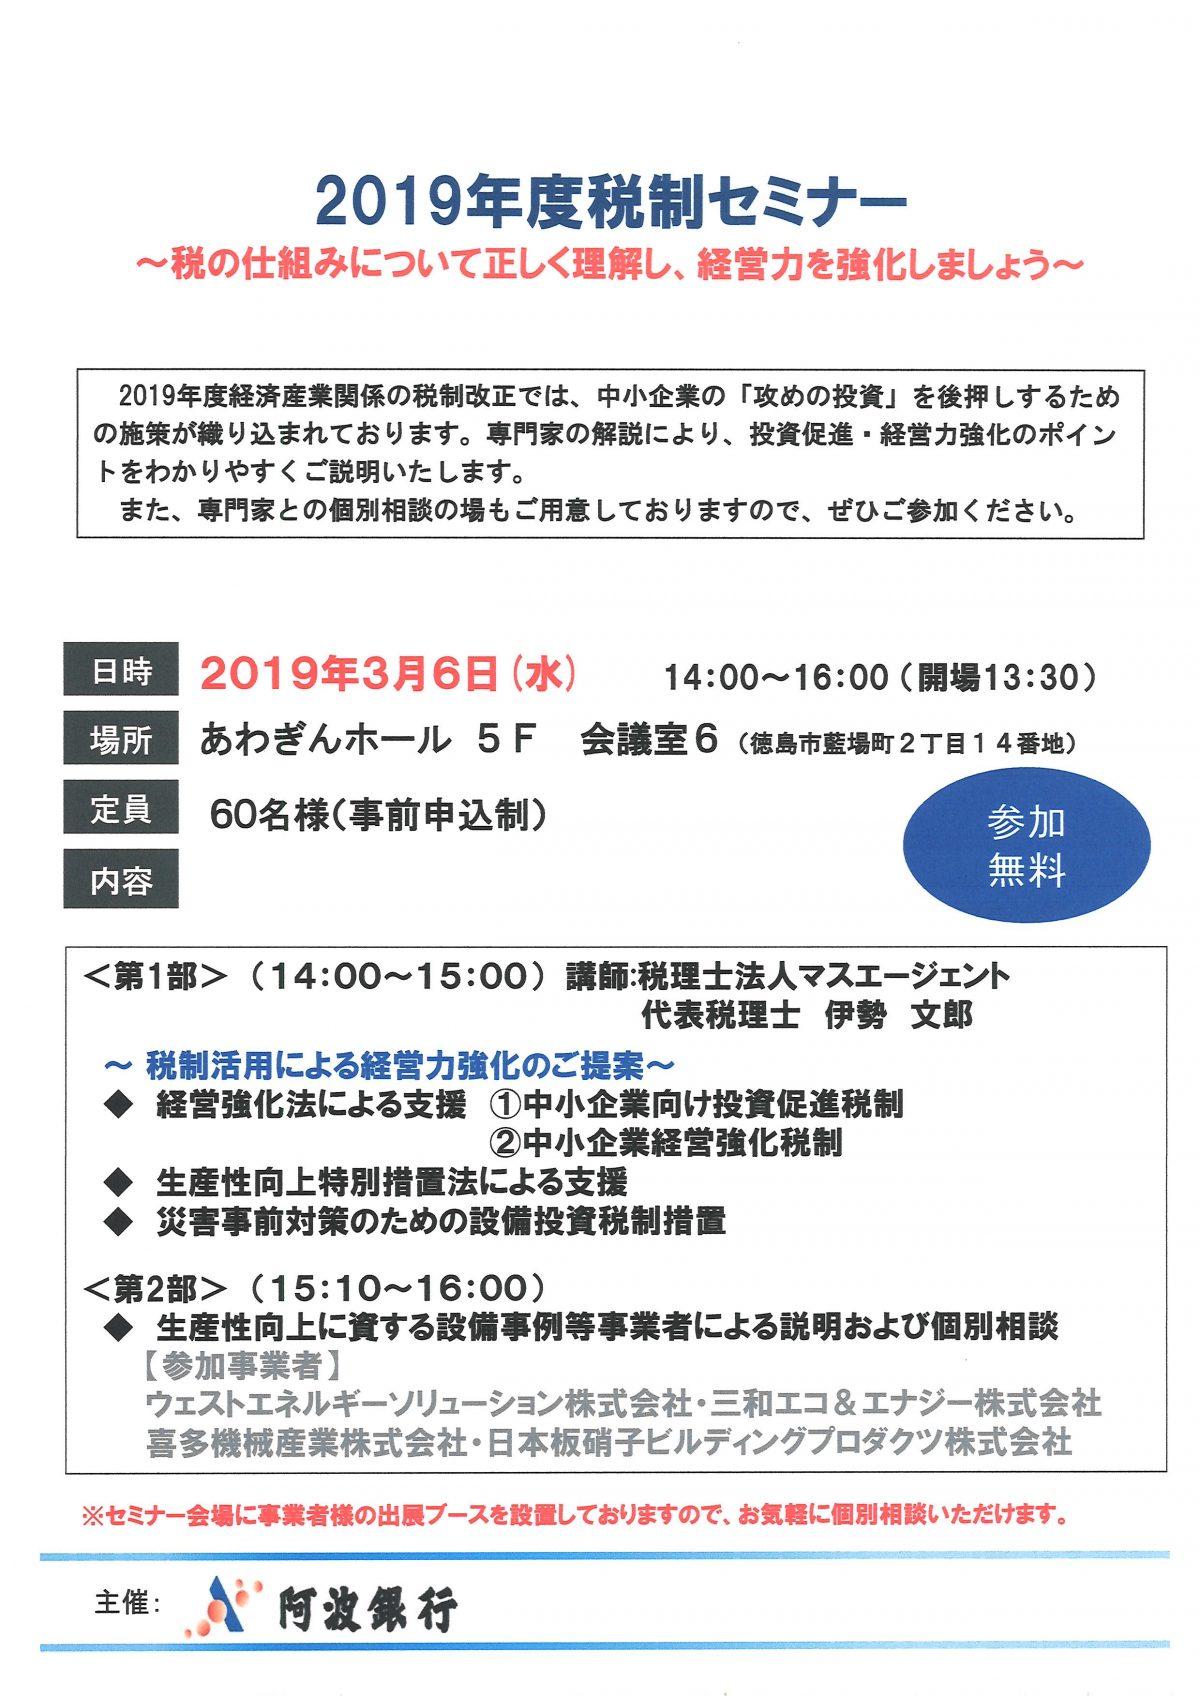 2019年度税制セミナー 参加受付中